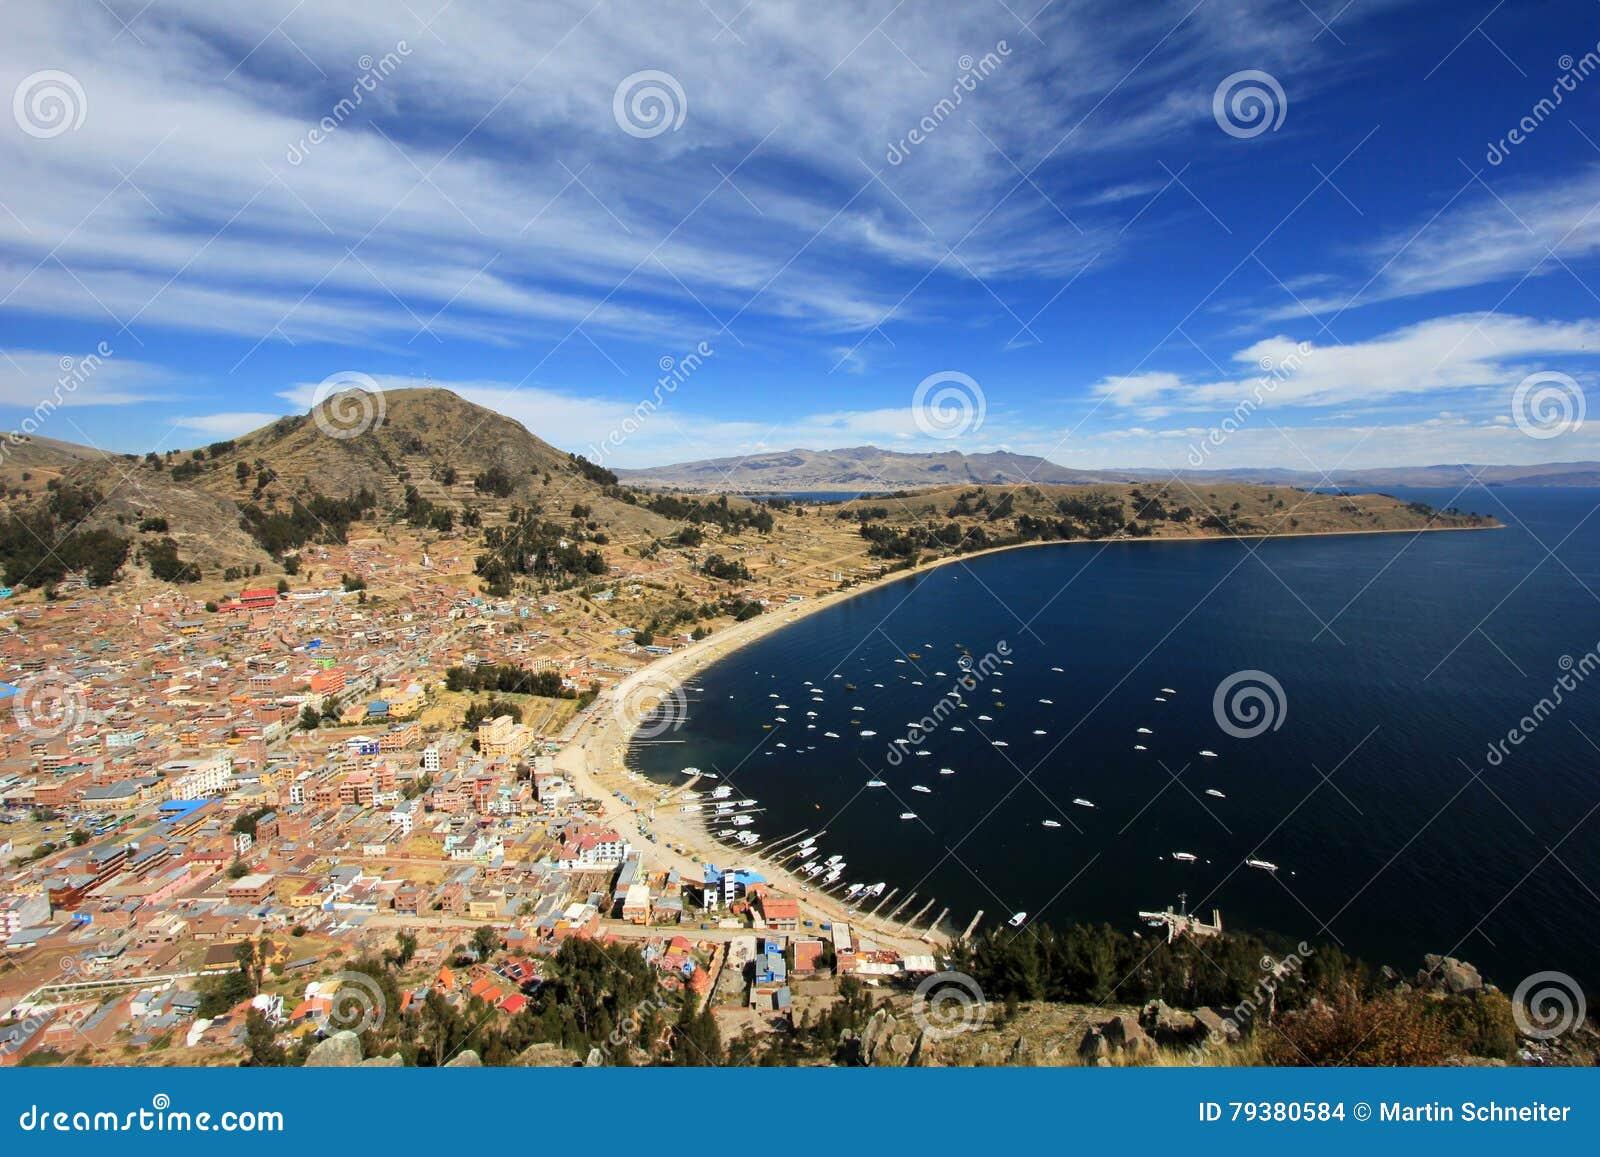 Bay in Copacabana Bolivia, lake Titicaca